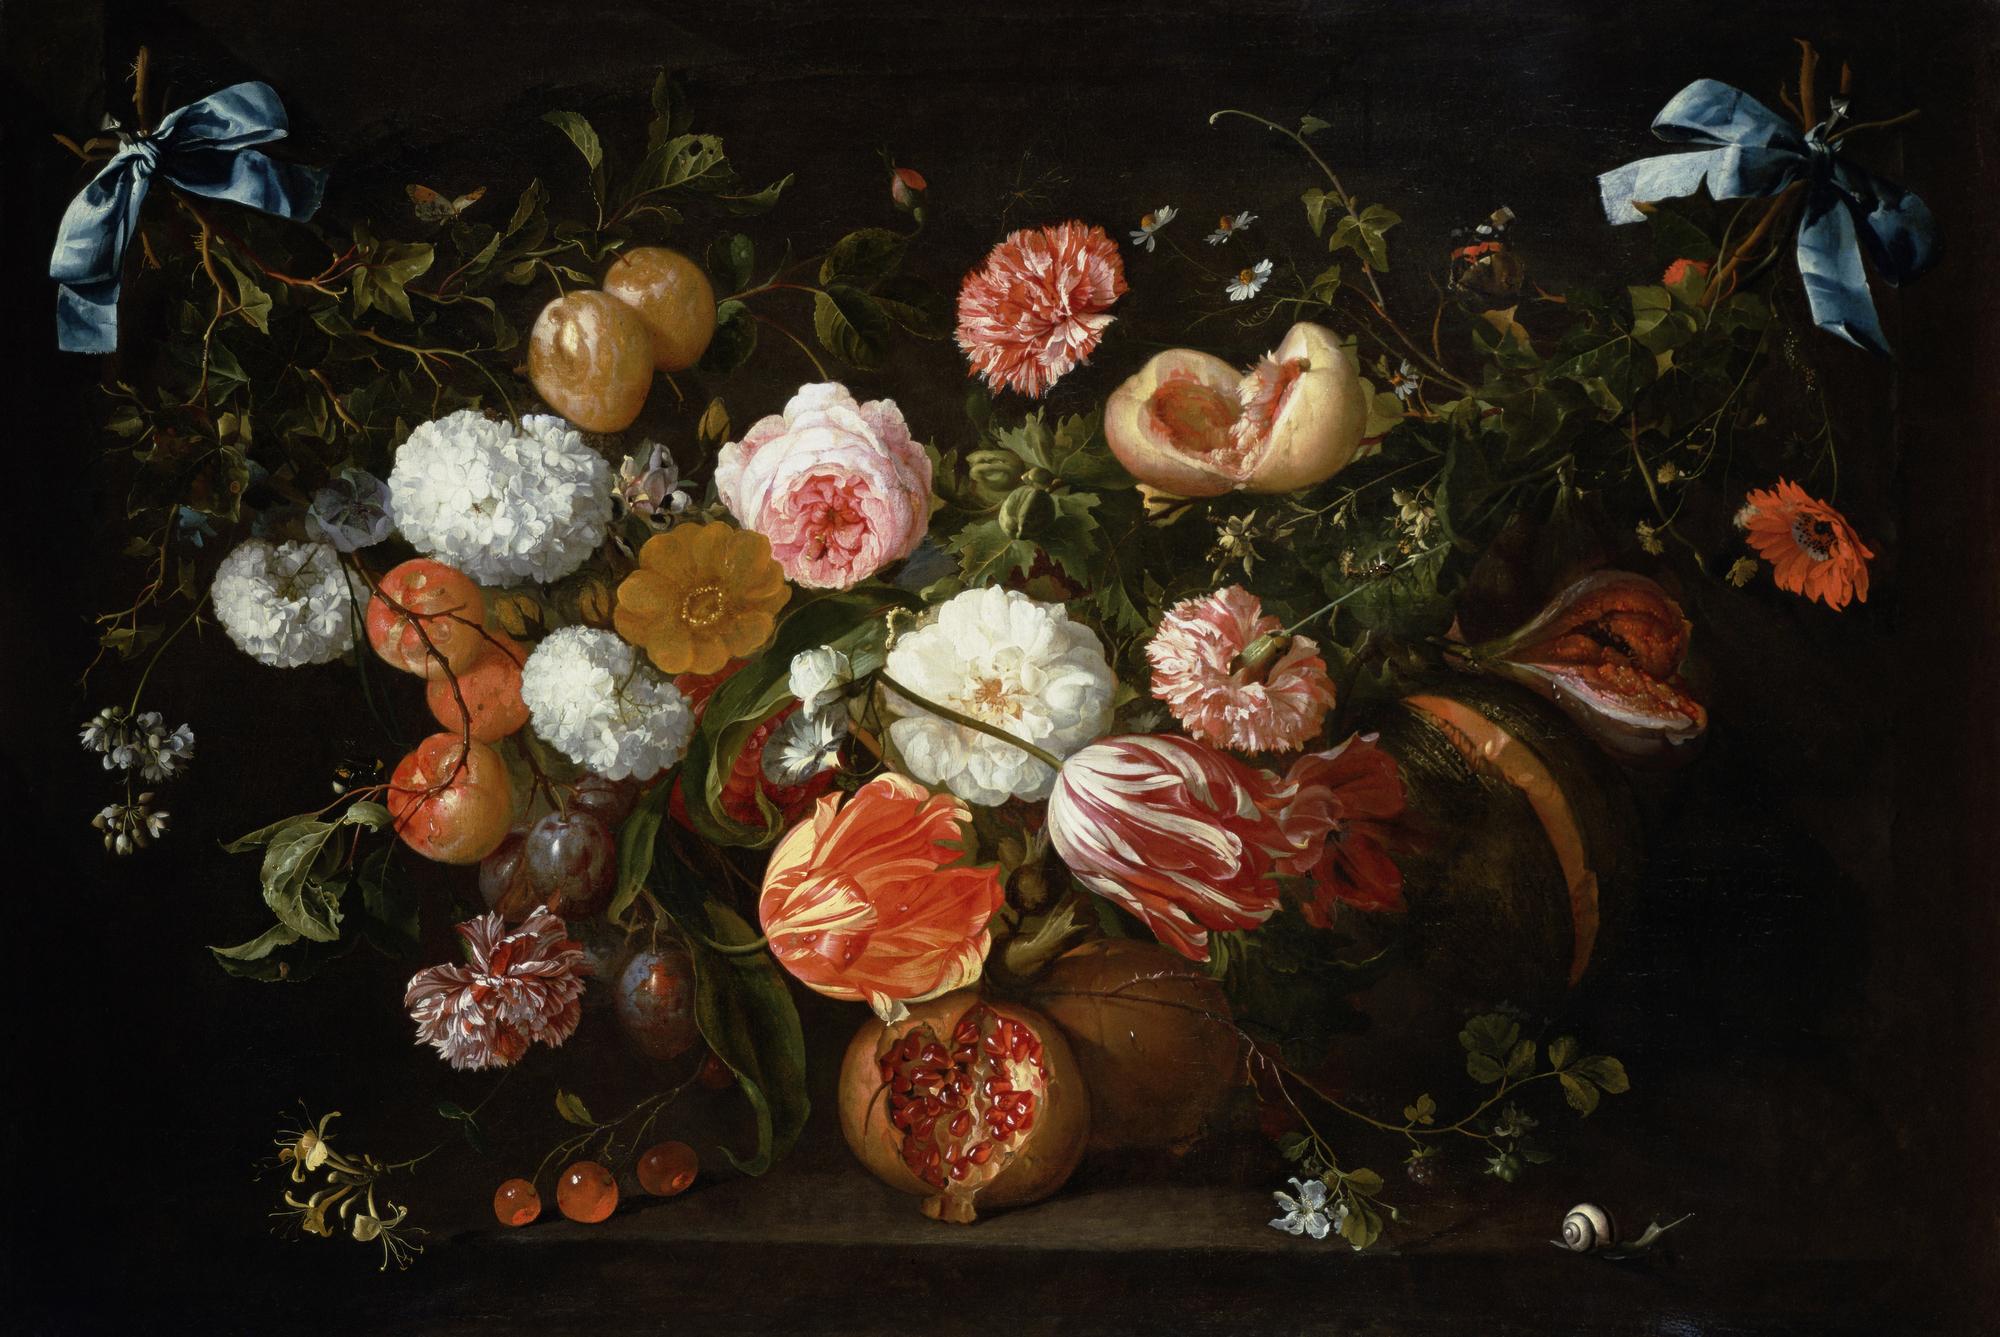 A Garland Of Flowers Oil On Canvas By Jan Davidsz De Heem Mural